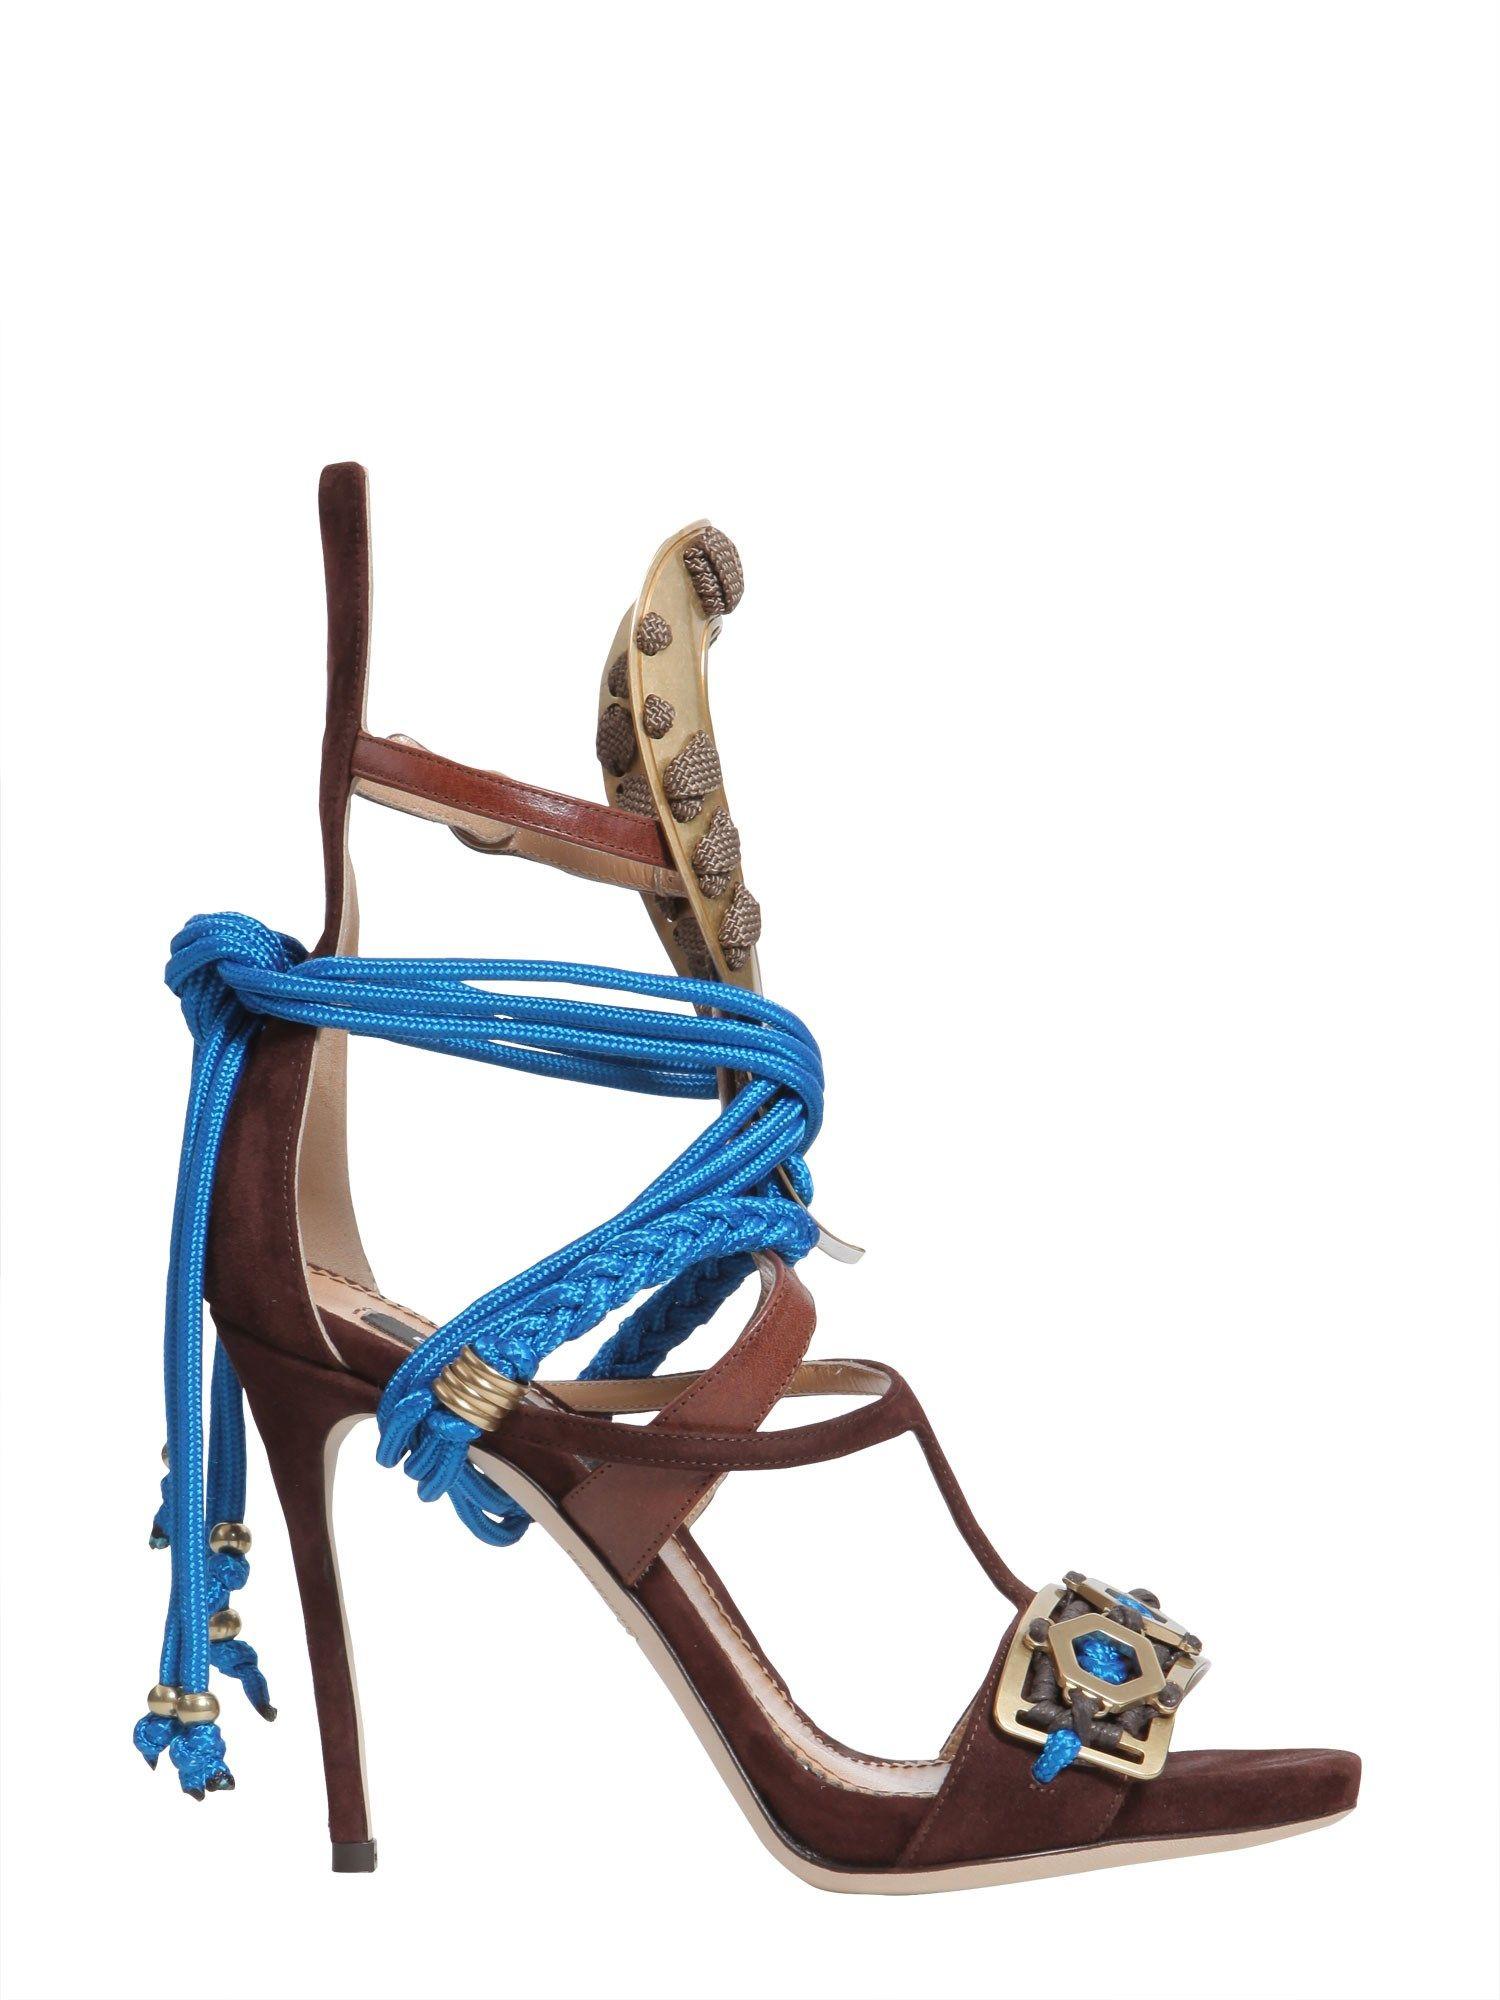 Samurai Sandal With Metal Inserts